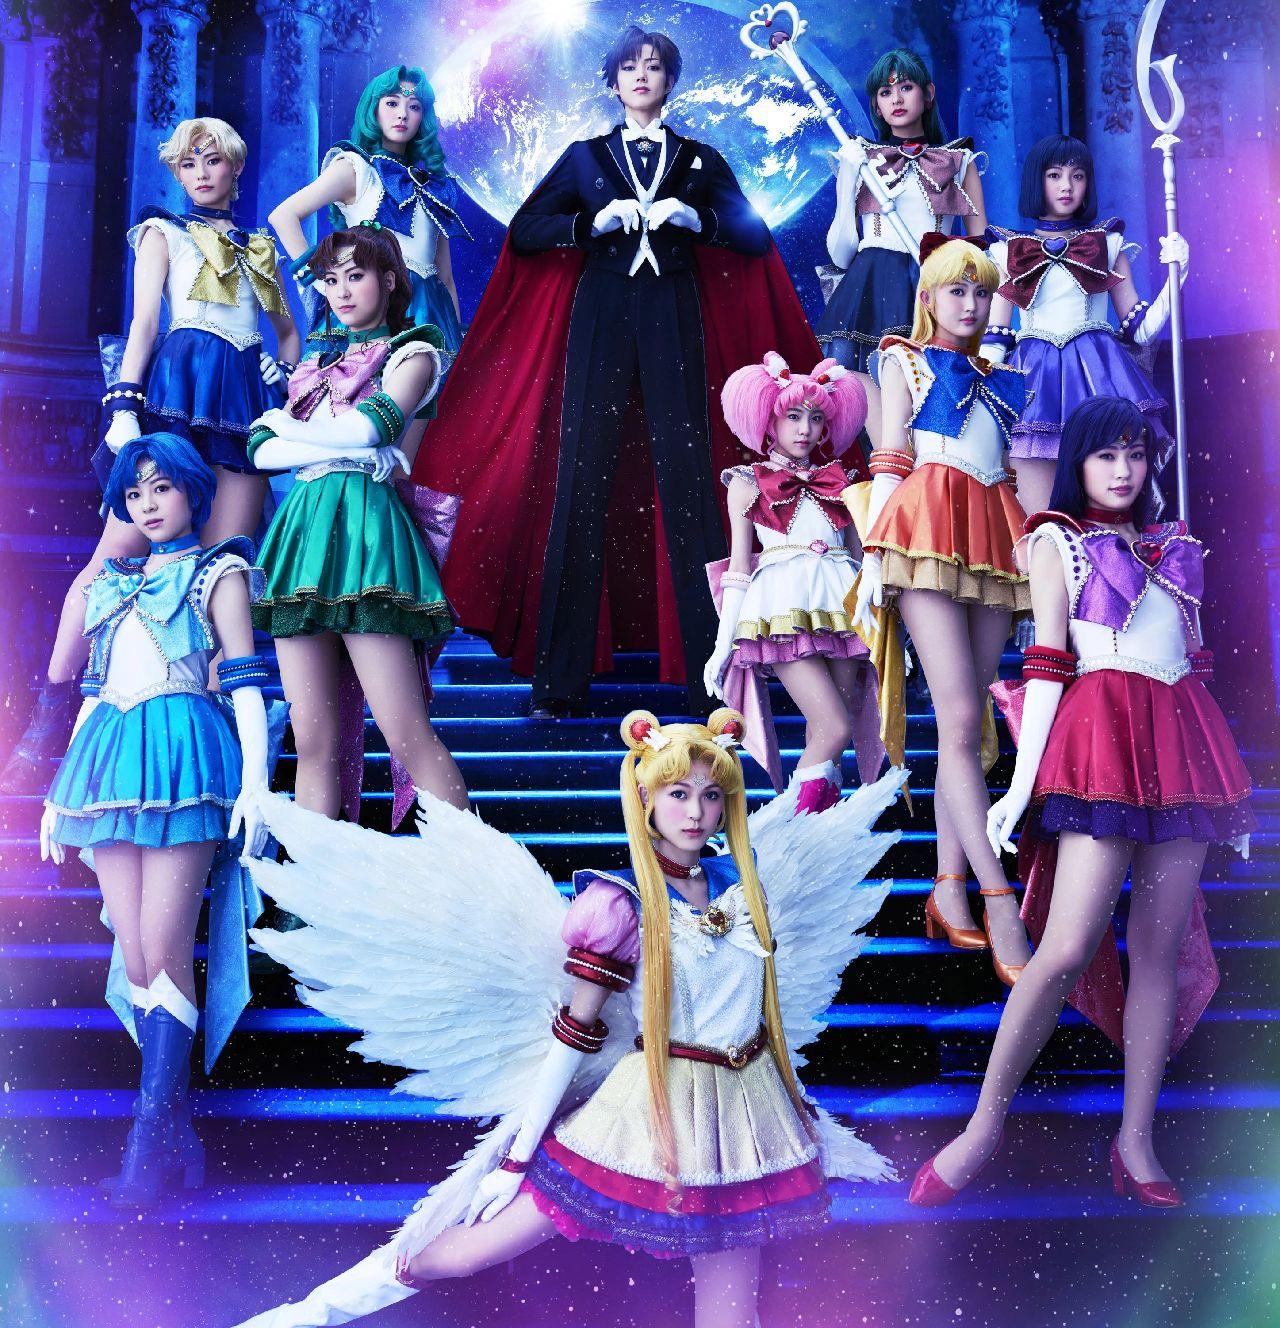 personajes sailor moon musical teatro